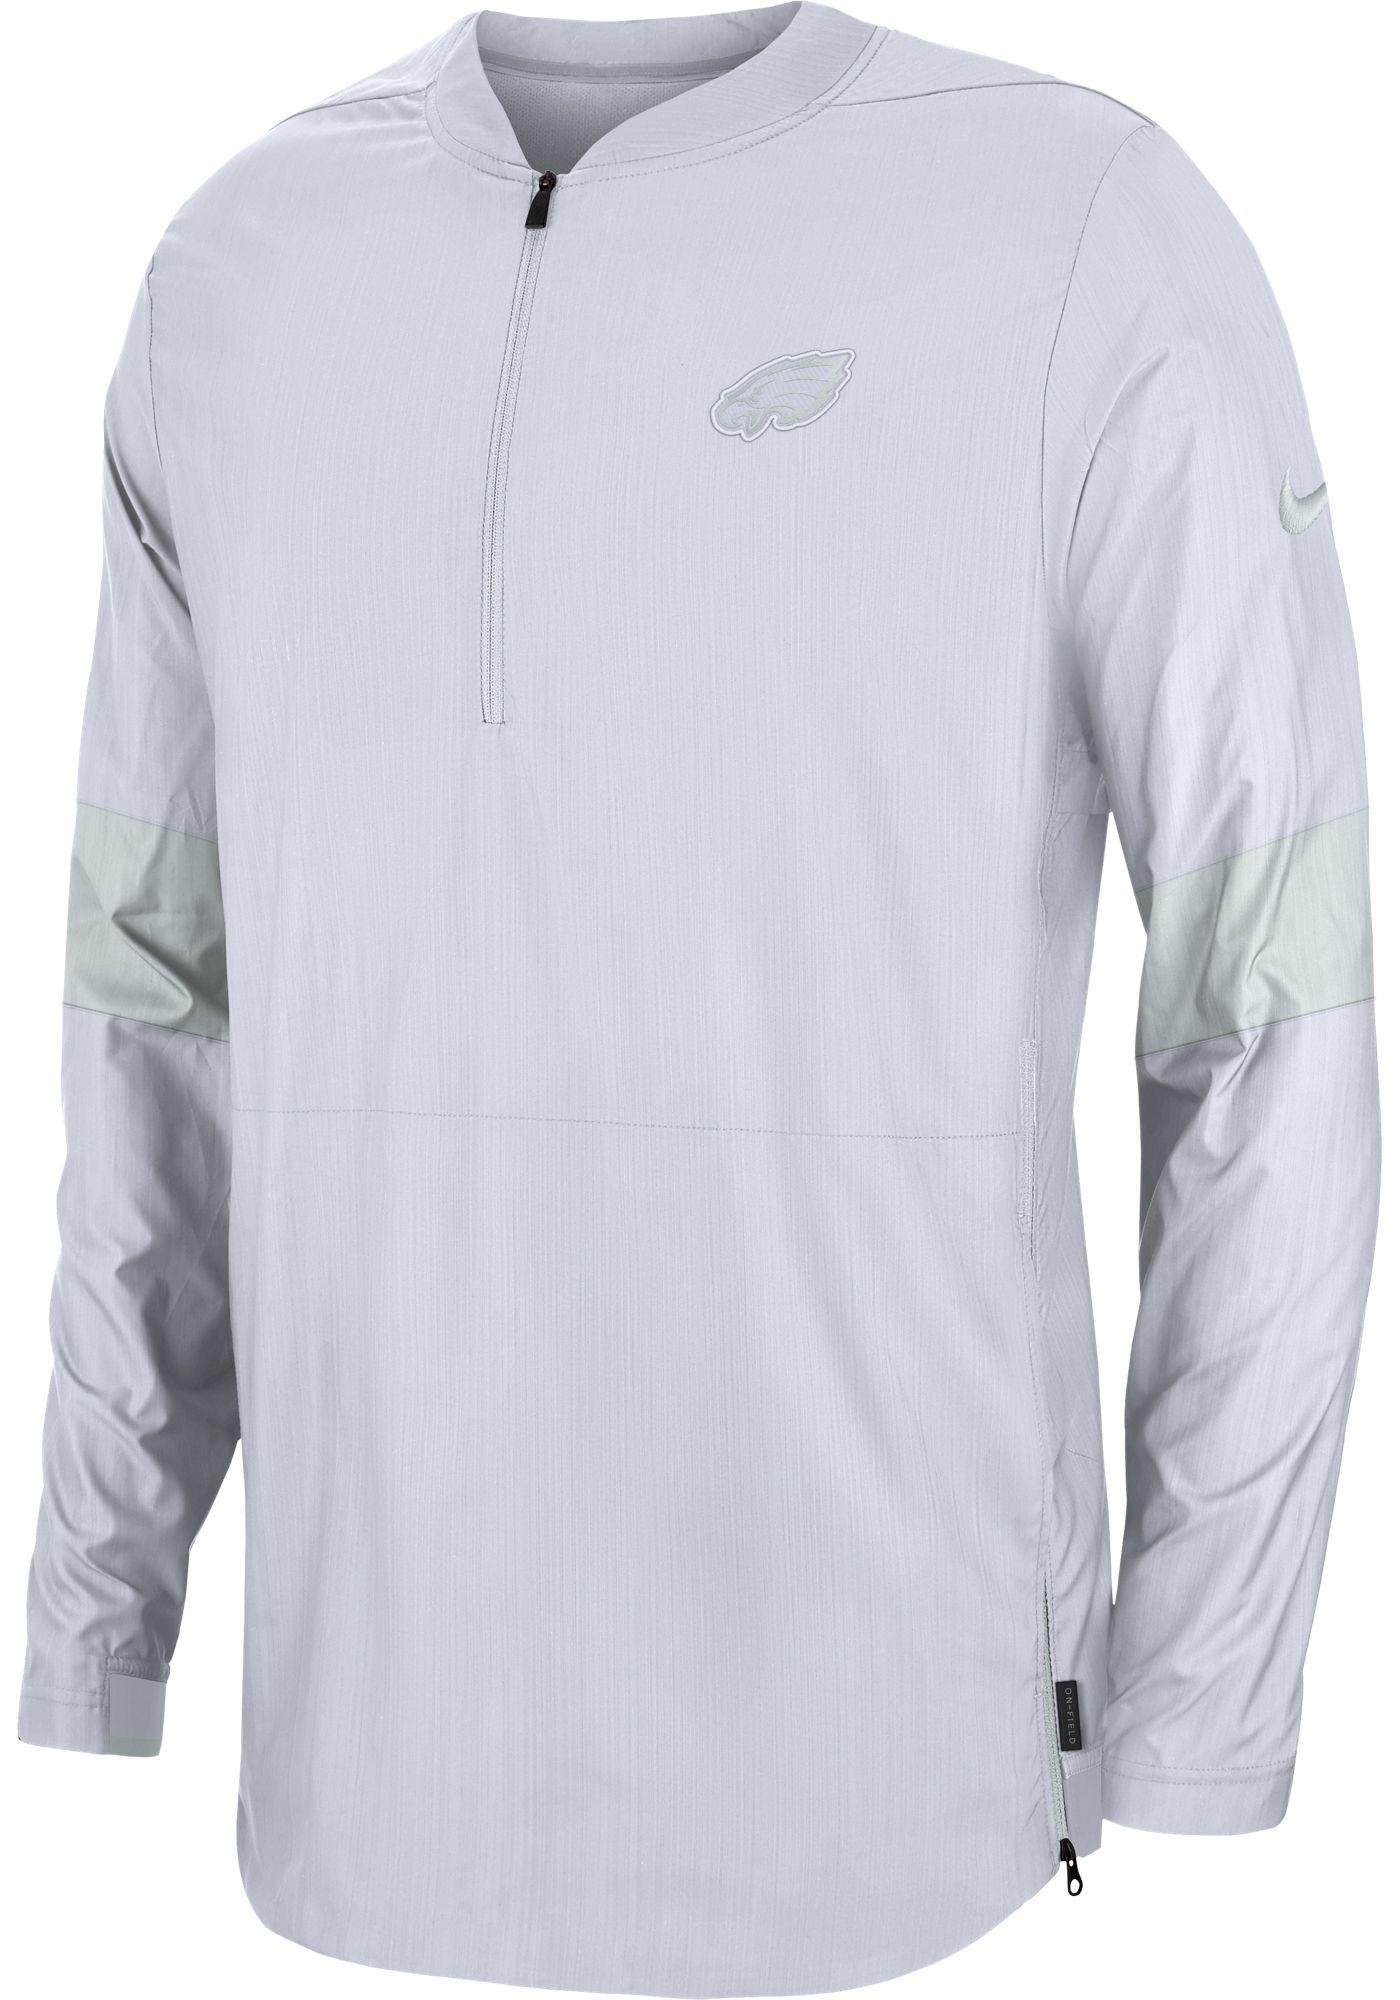 Nike Men's Philadelphia Eagles Sideline Coach White Half-Zip Performance Jacket